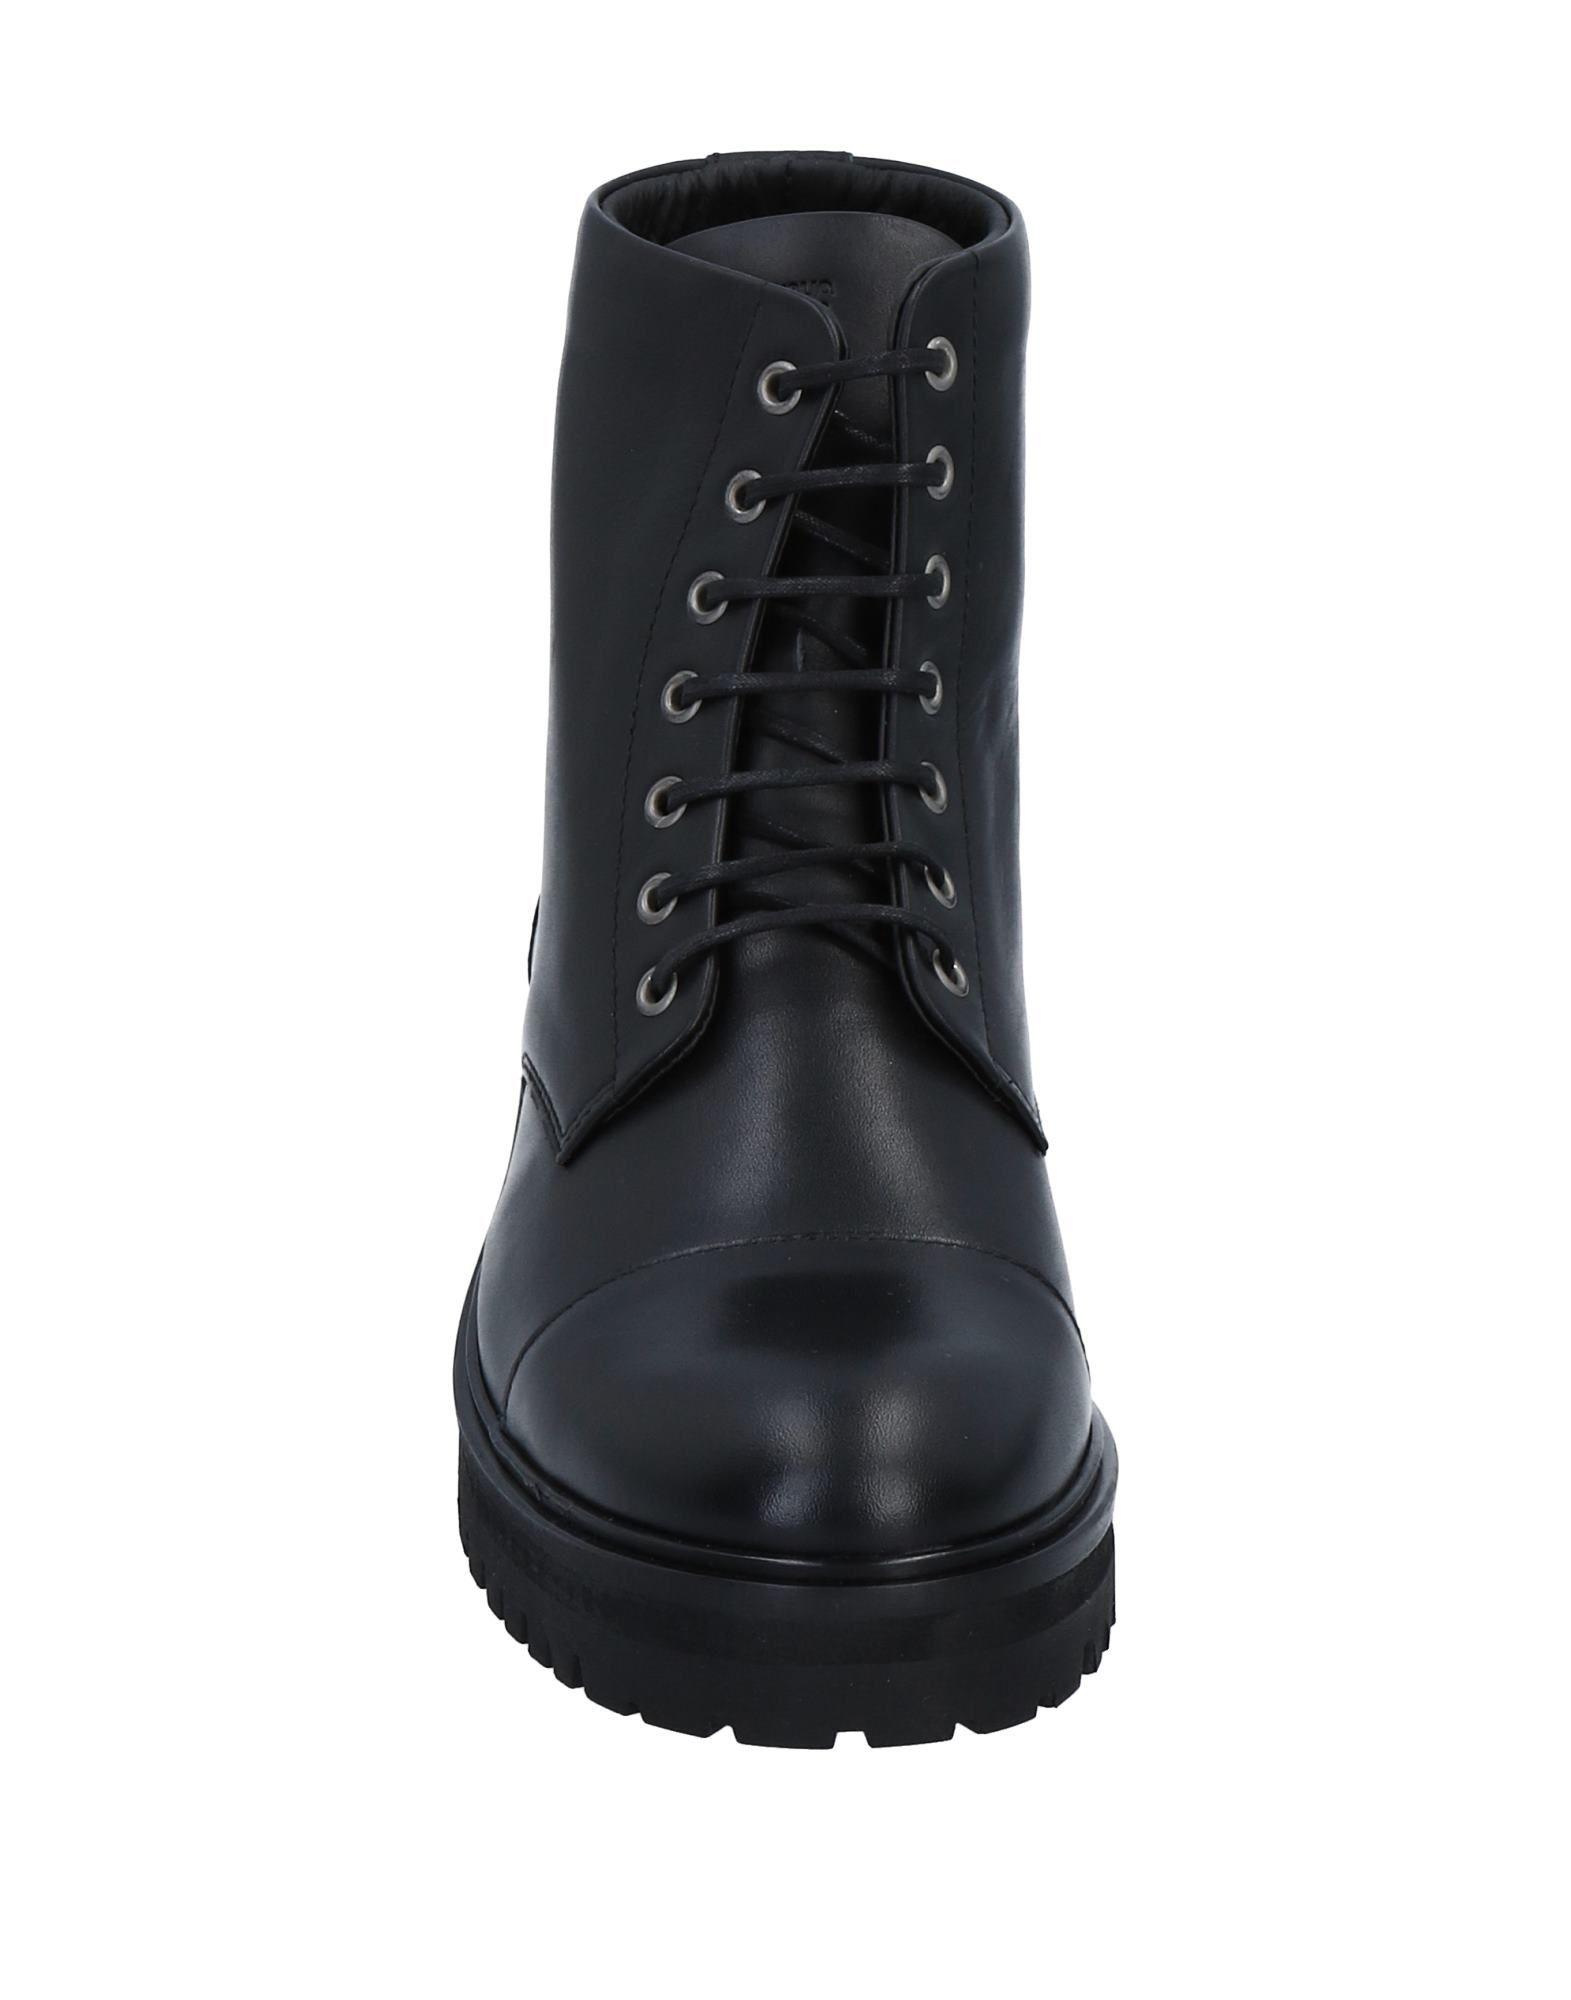 Royal Republiq Stiefelette strapazierfähige Damen  11543464QLGut aussehende strapazierfähige Stiefelette Schuhe fab1dd